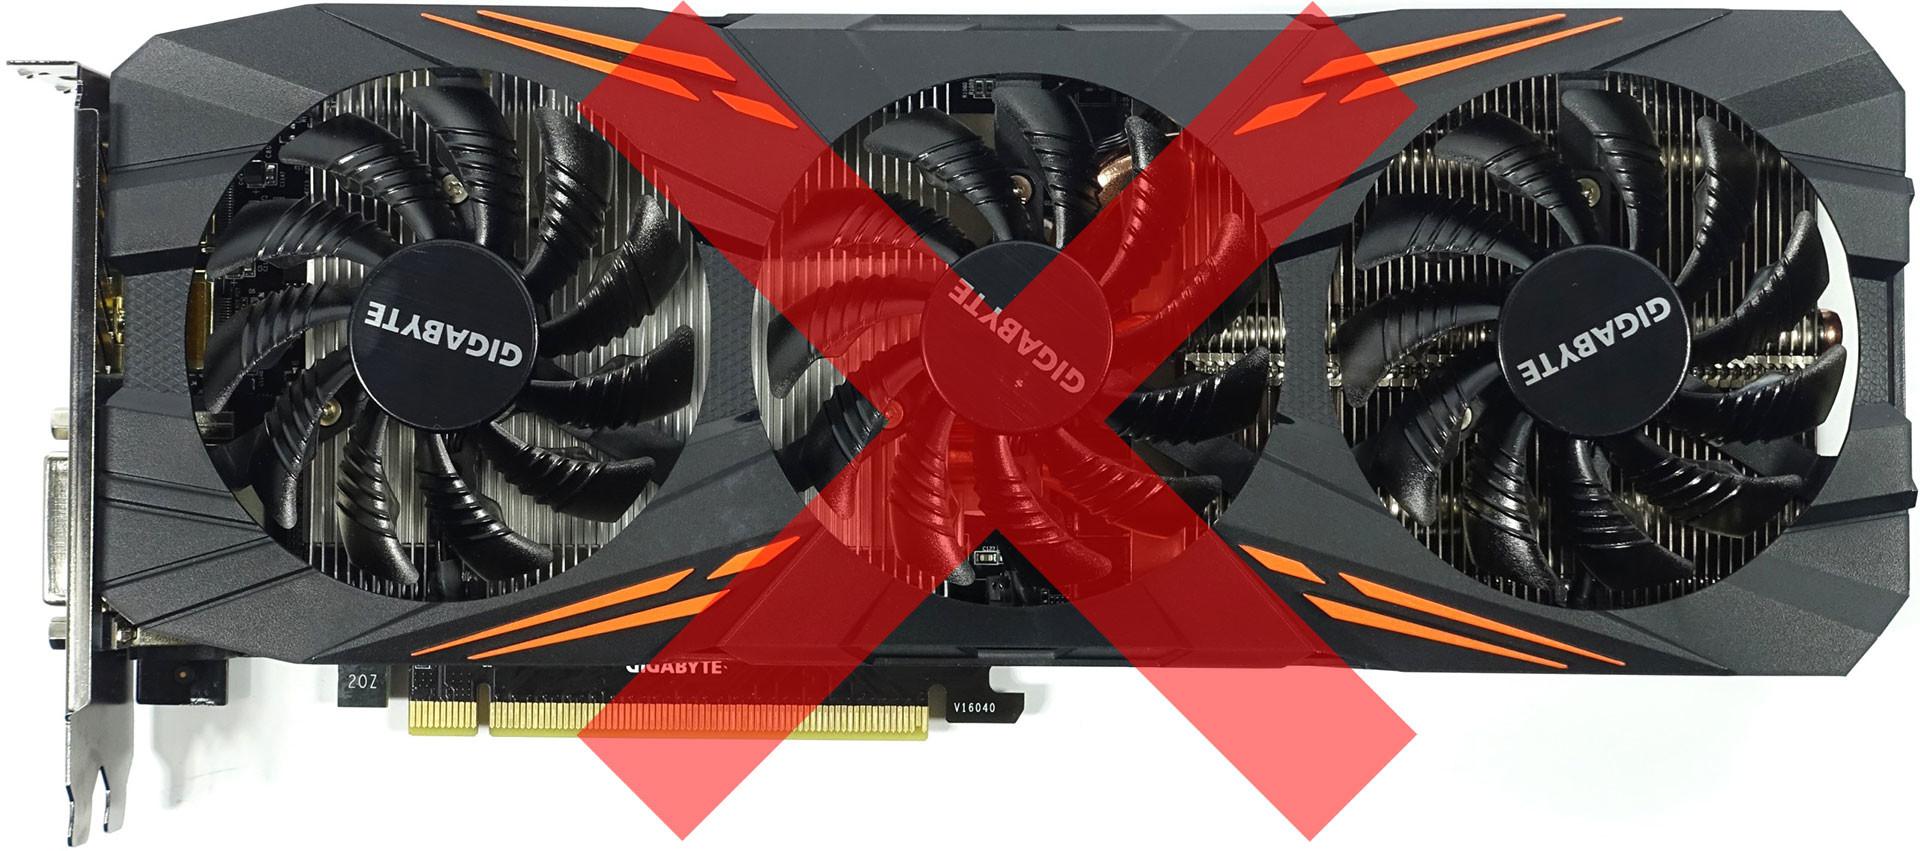 GIGABYTE Has No Plans to Release a Custom Radeon RX Vega 64